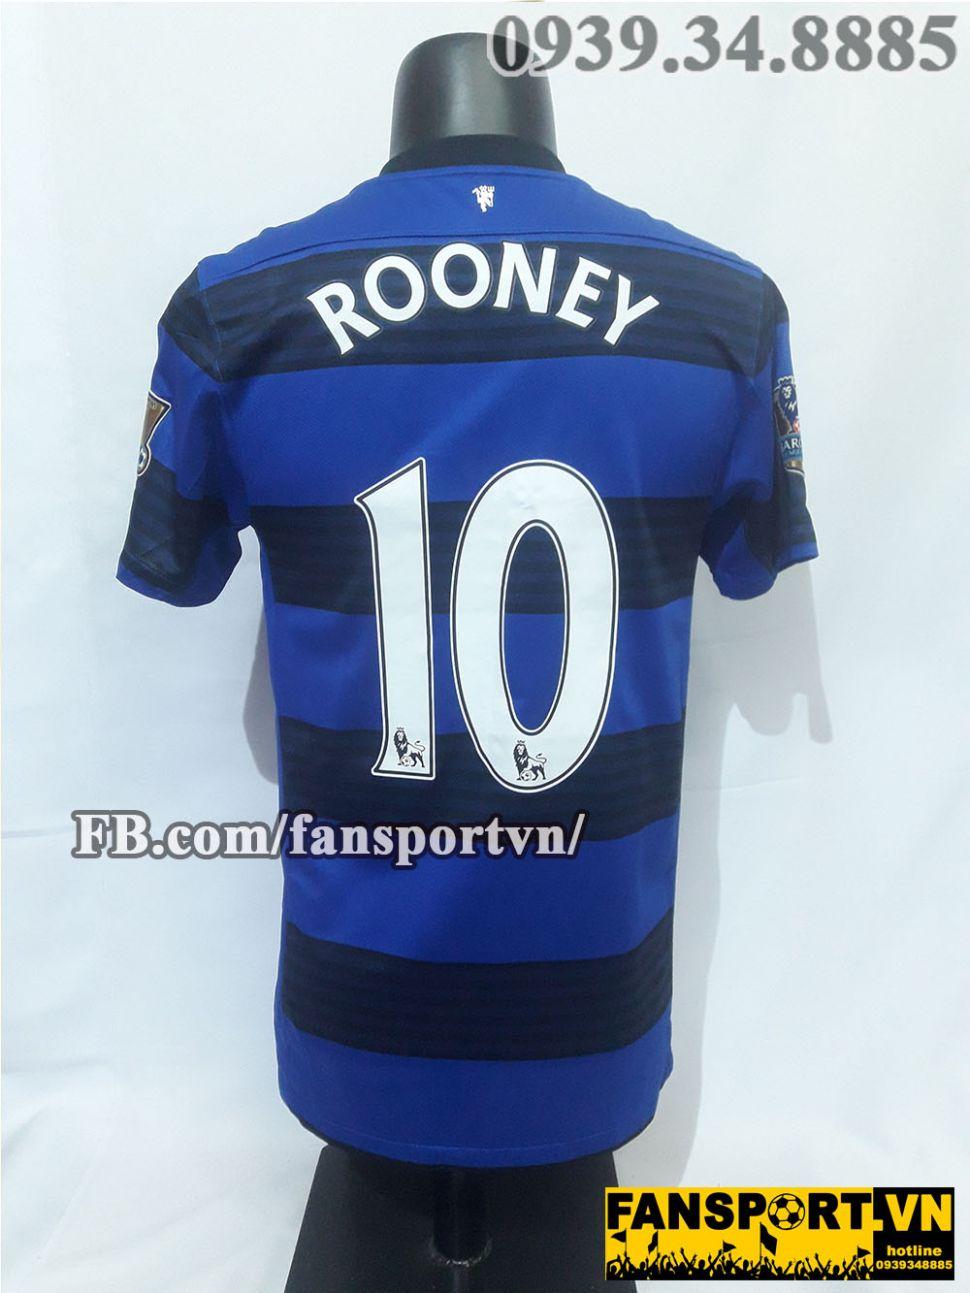 Áo đấu Rooney #10 Manchester United 2011-2012 away shirt jersey blue